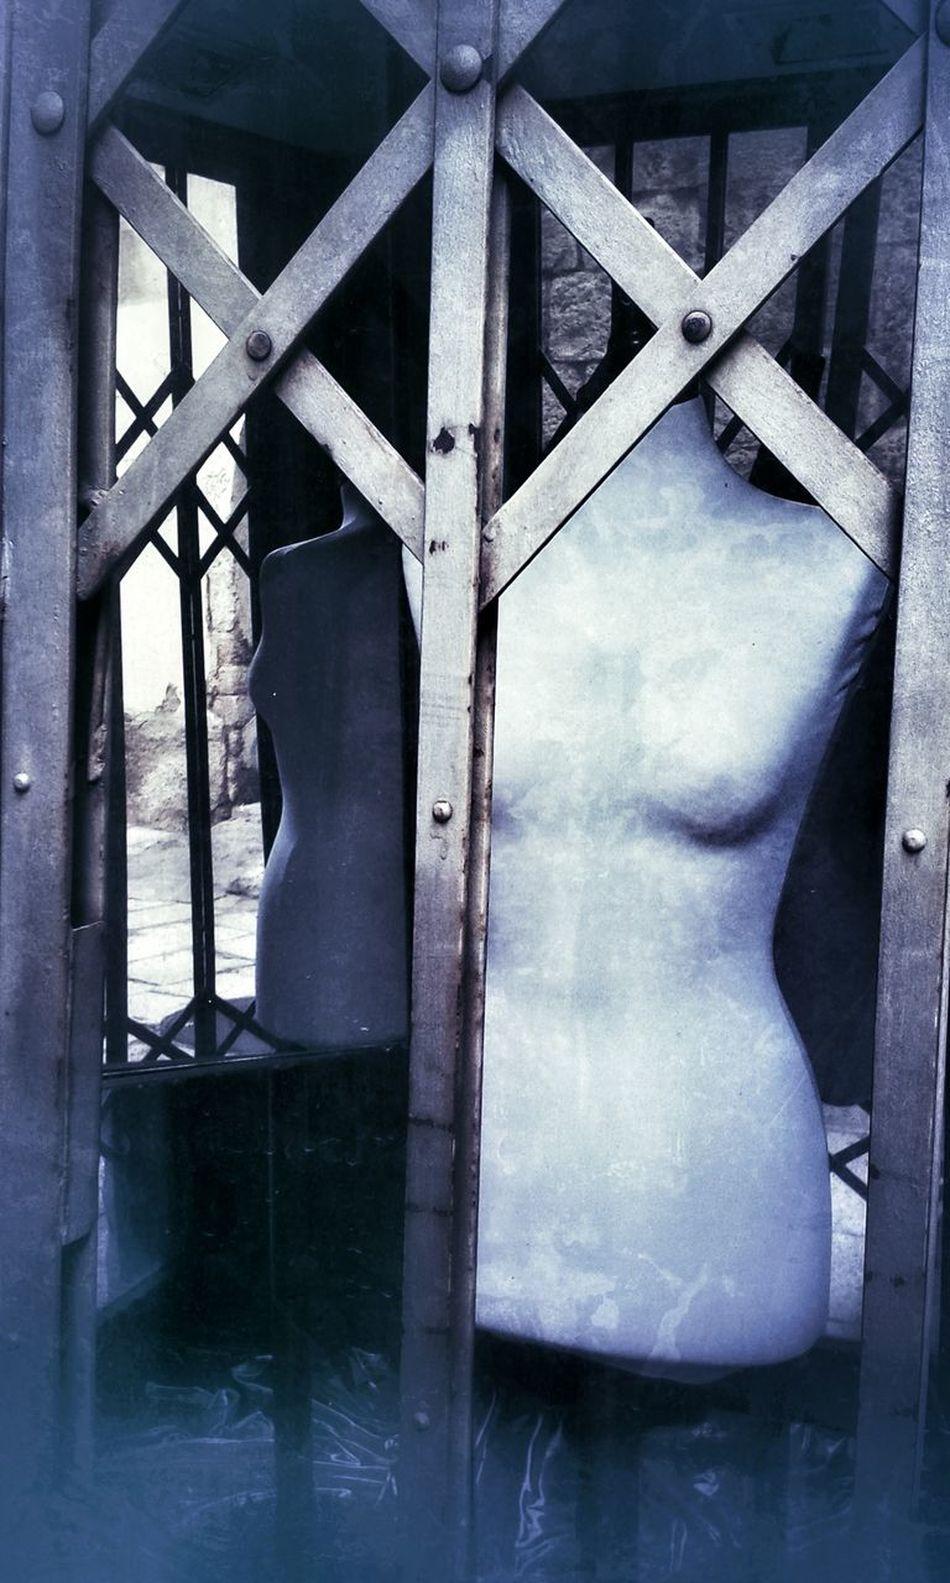 Armless Shop Window Mannequin Bars Creepy Vintage Old Shop